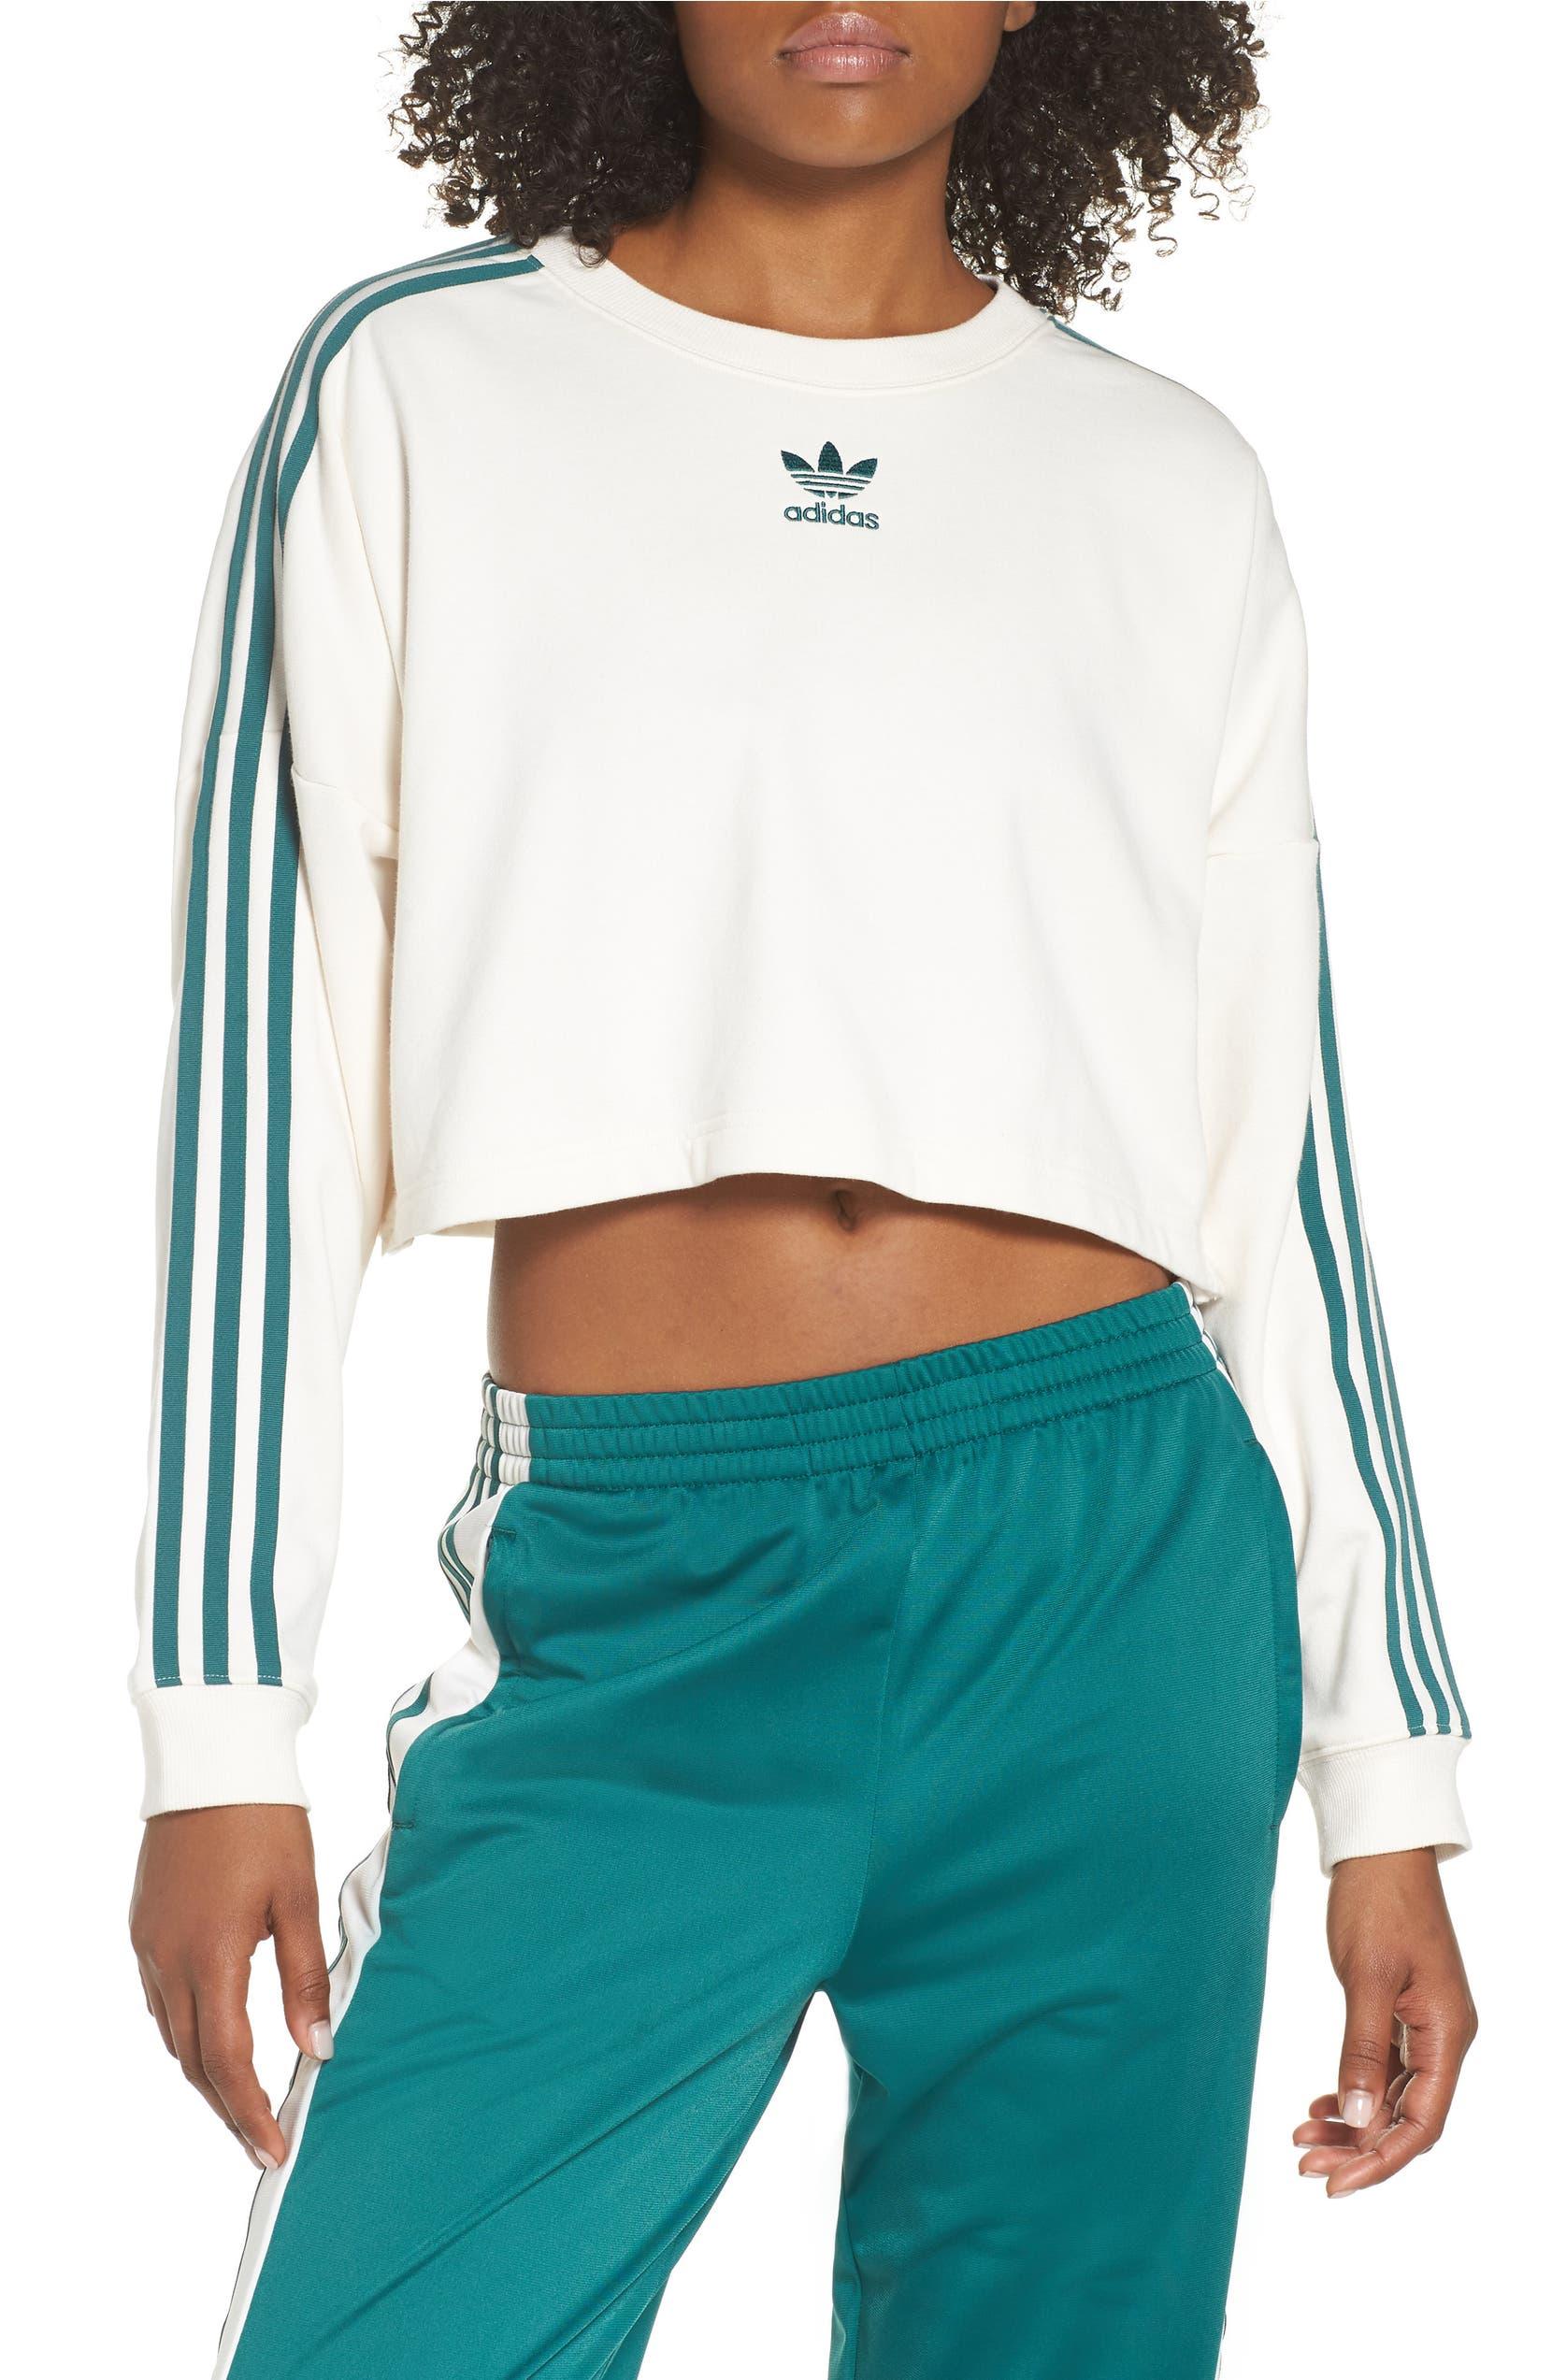 finest selection 37a1c 55430 adidas originals adibreak cropped sweatshirt   Nordstrom